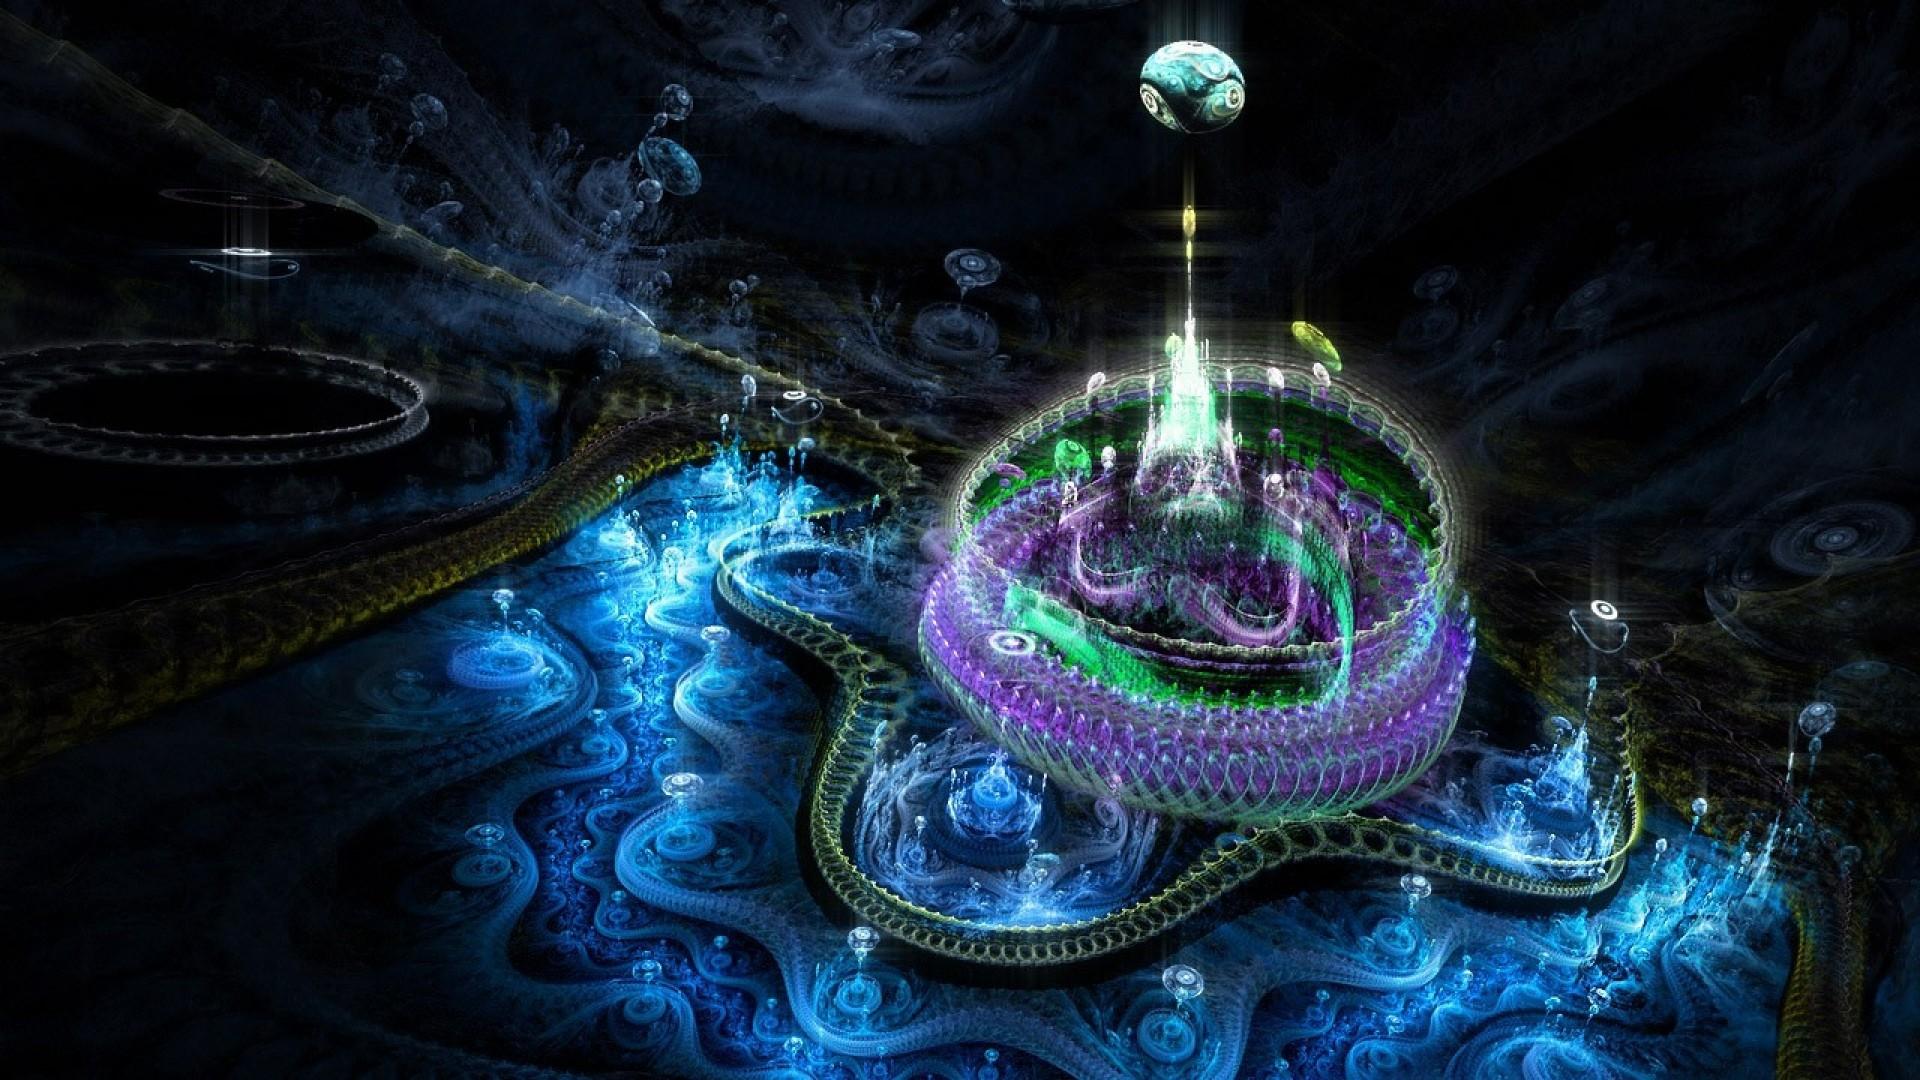 … Background Full HD 1080p. Wallpaper fractal, city, world,  imagination, smoke